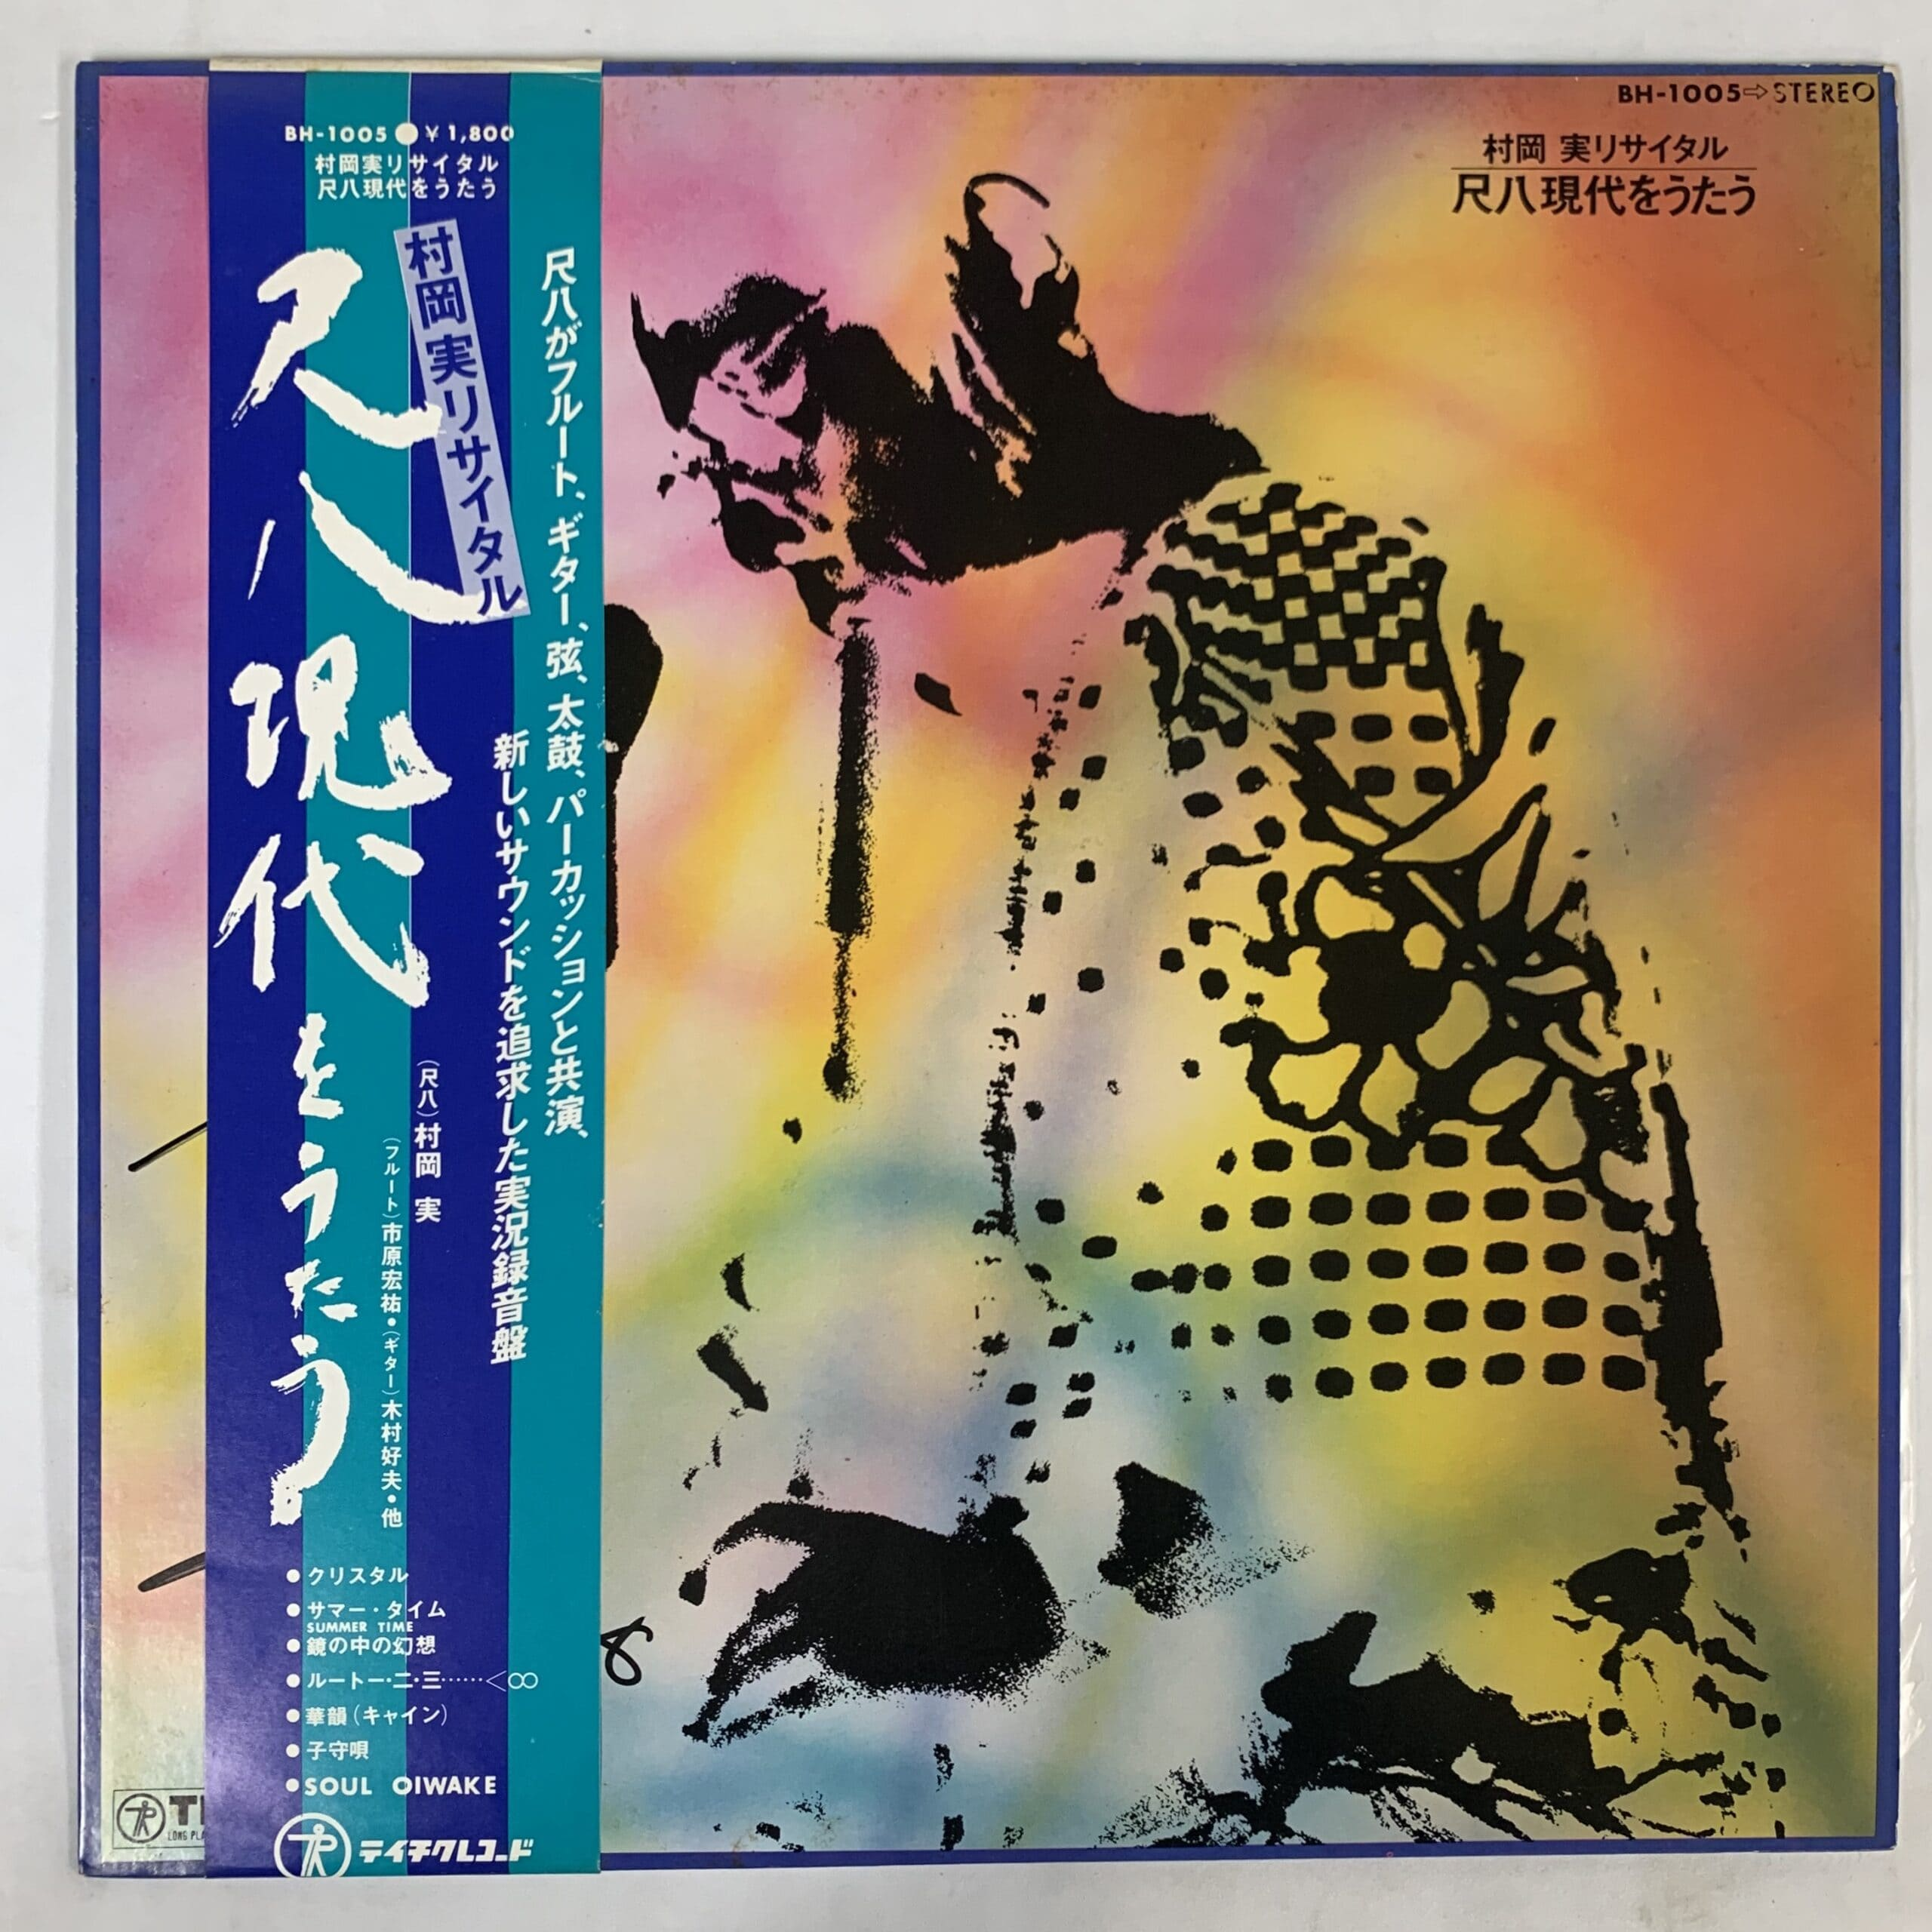 Minoru Muraoka  / 尺八 現代をうたう / Shakuhachi Gendai O Utau / BH-1005 / 帯付